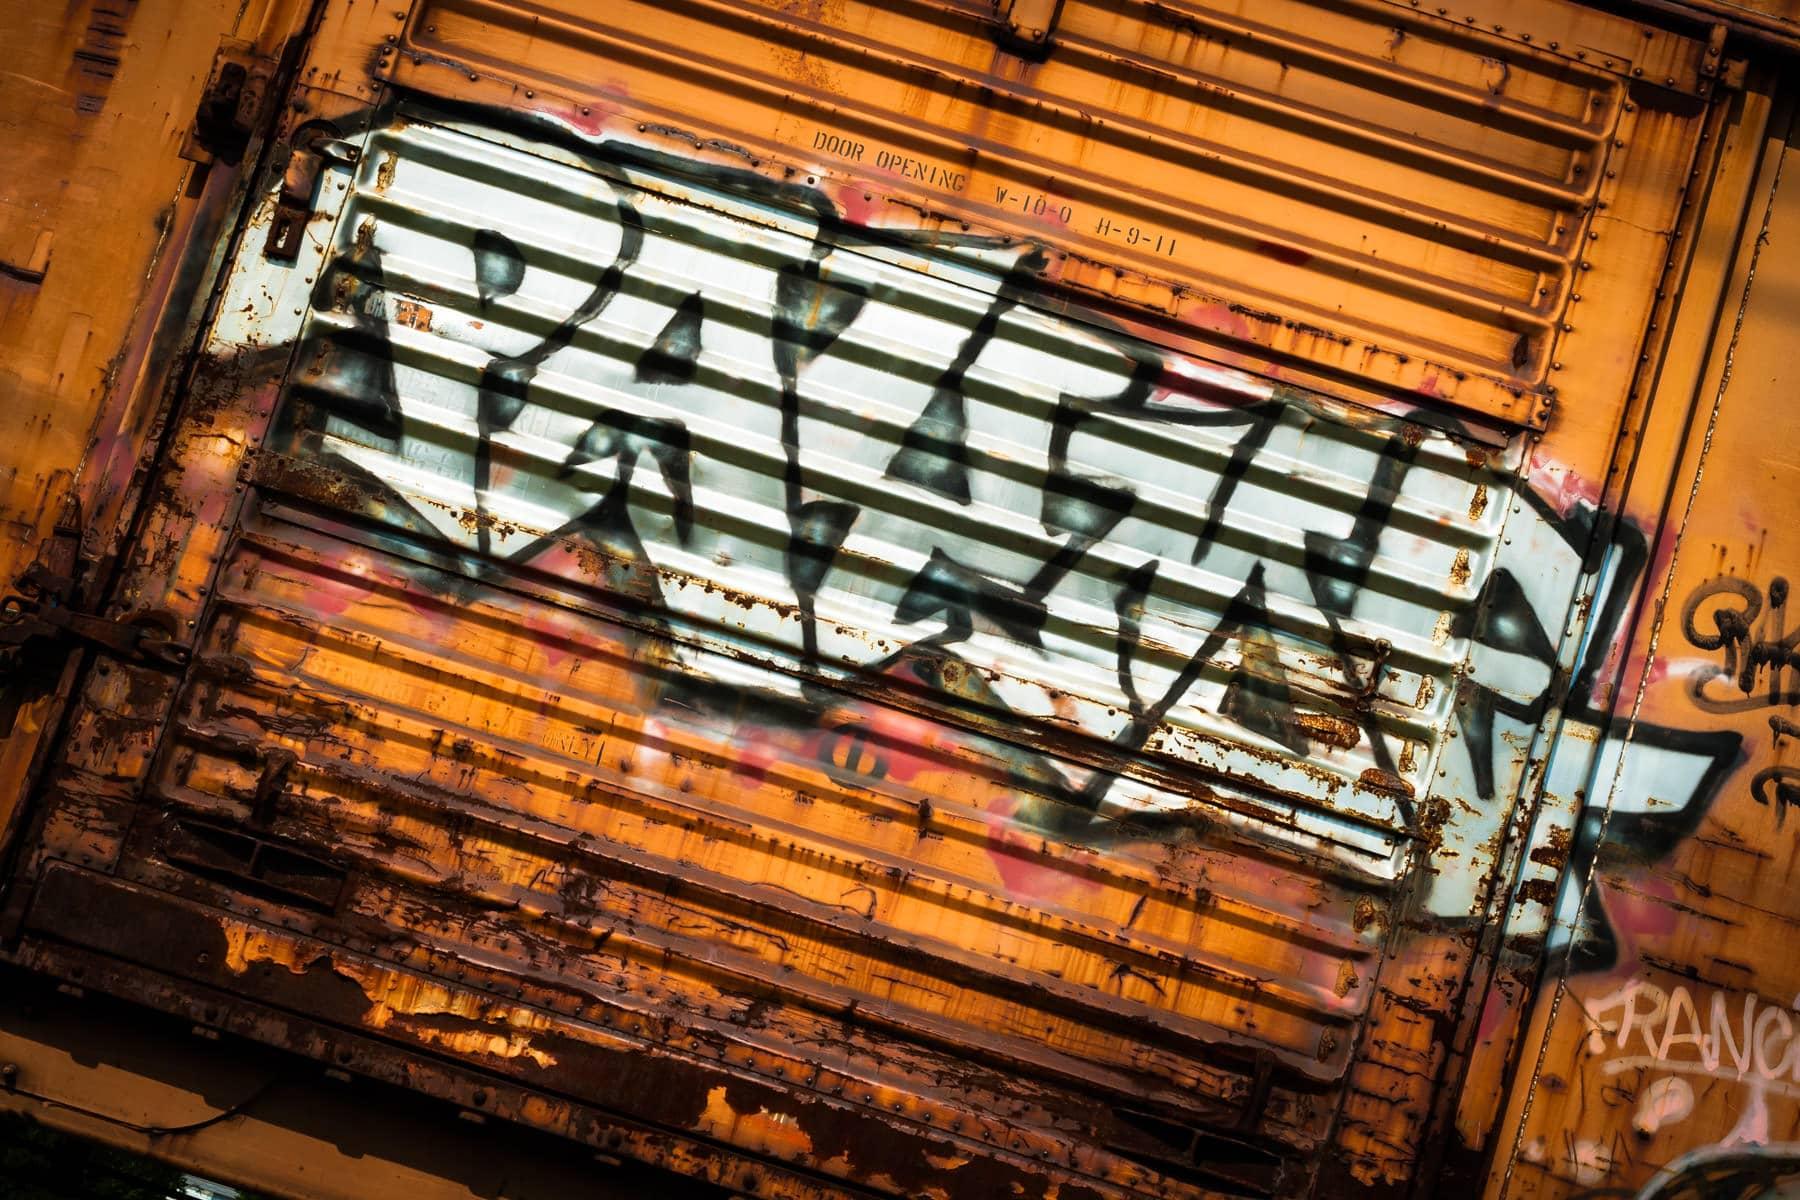 Graffiti on a railroad box car in Farmers Branch, Texas.